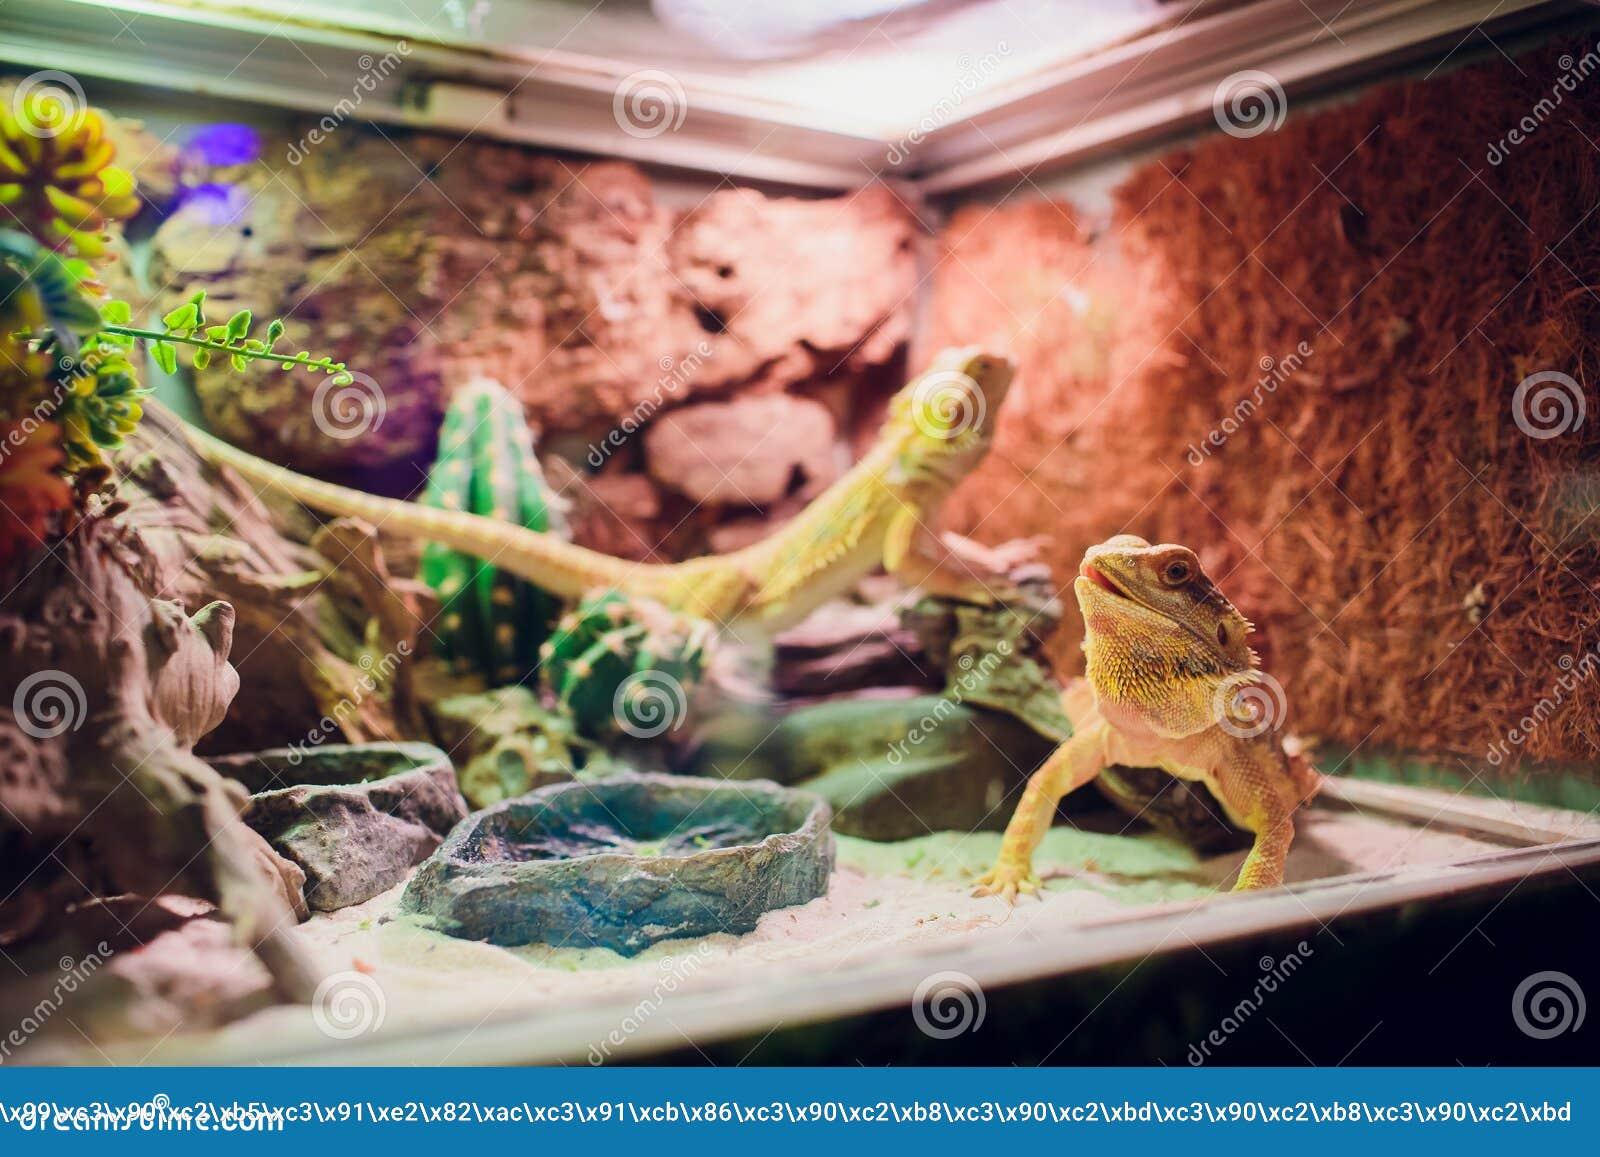 Big Iguana Lizard In Terrarium Animal Background Stock Photo